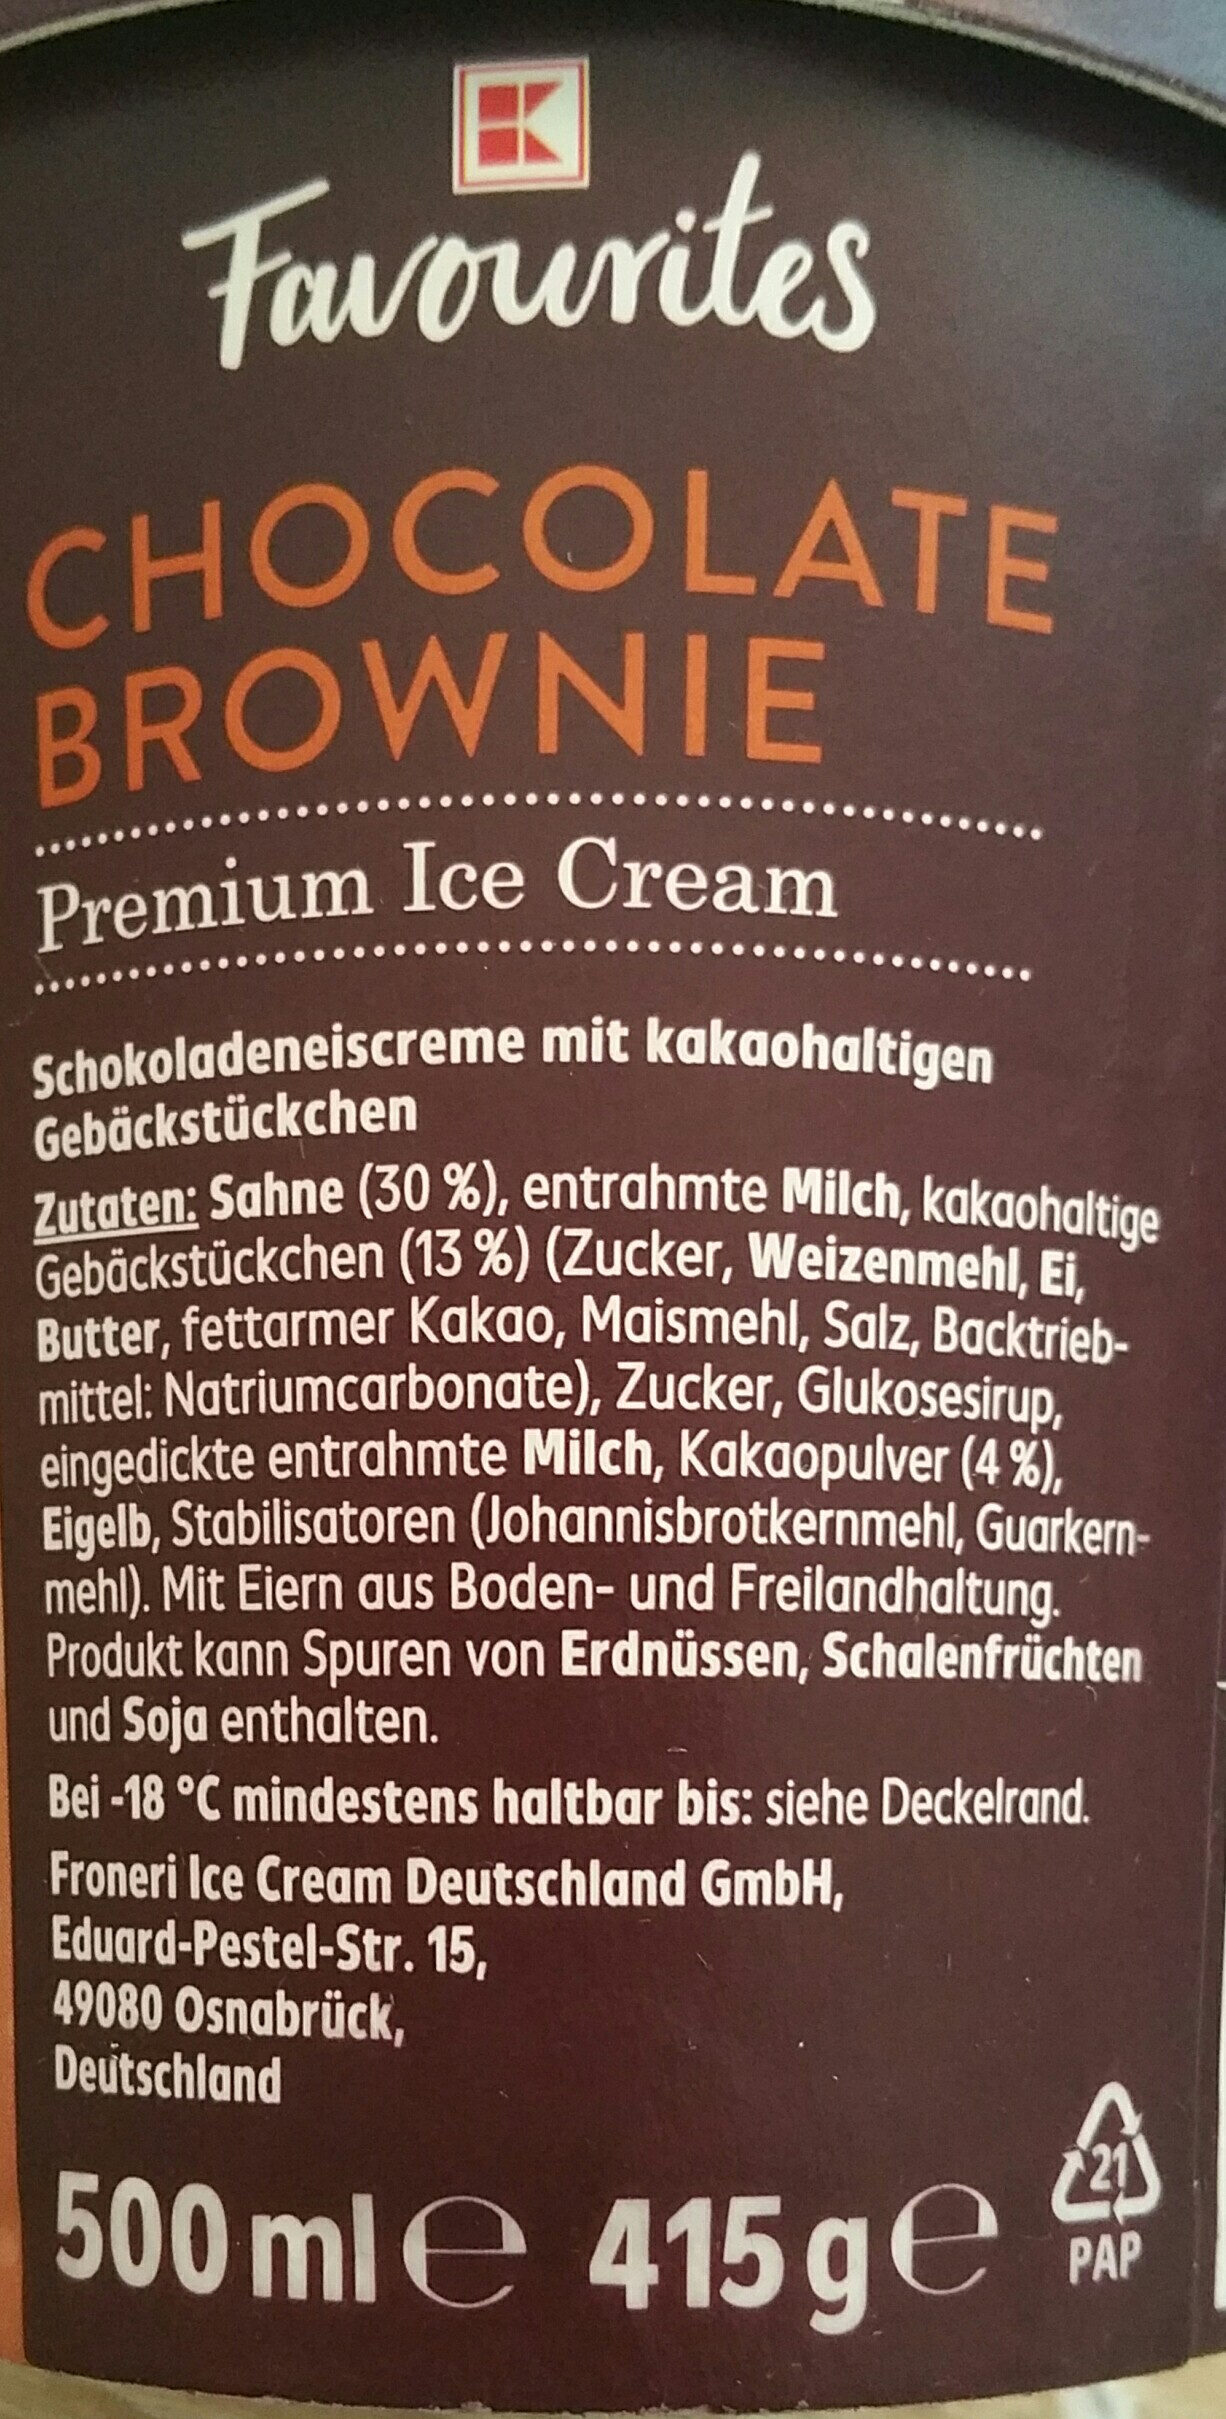 Chocolate Brownie Premium Ice Cream - Inhaltsstoffe - de